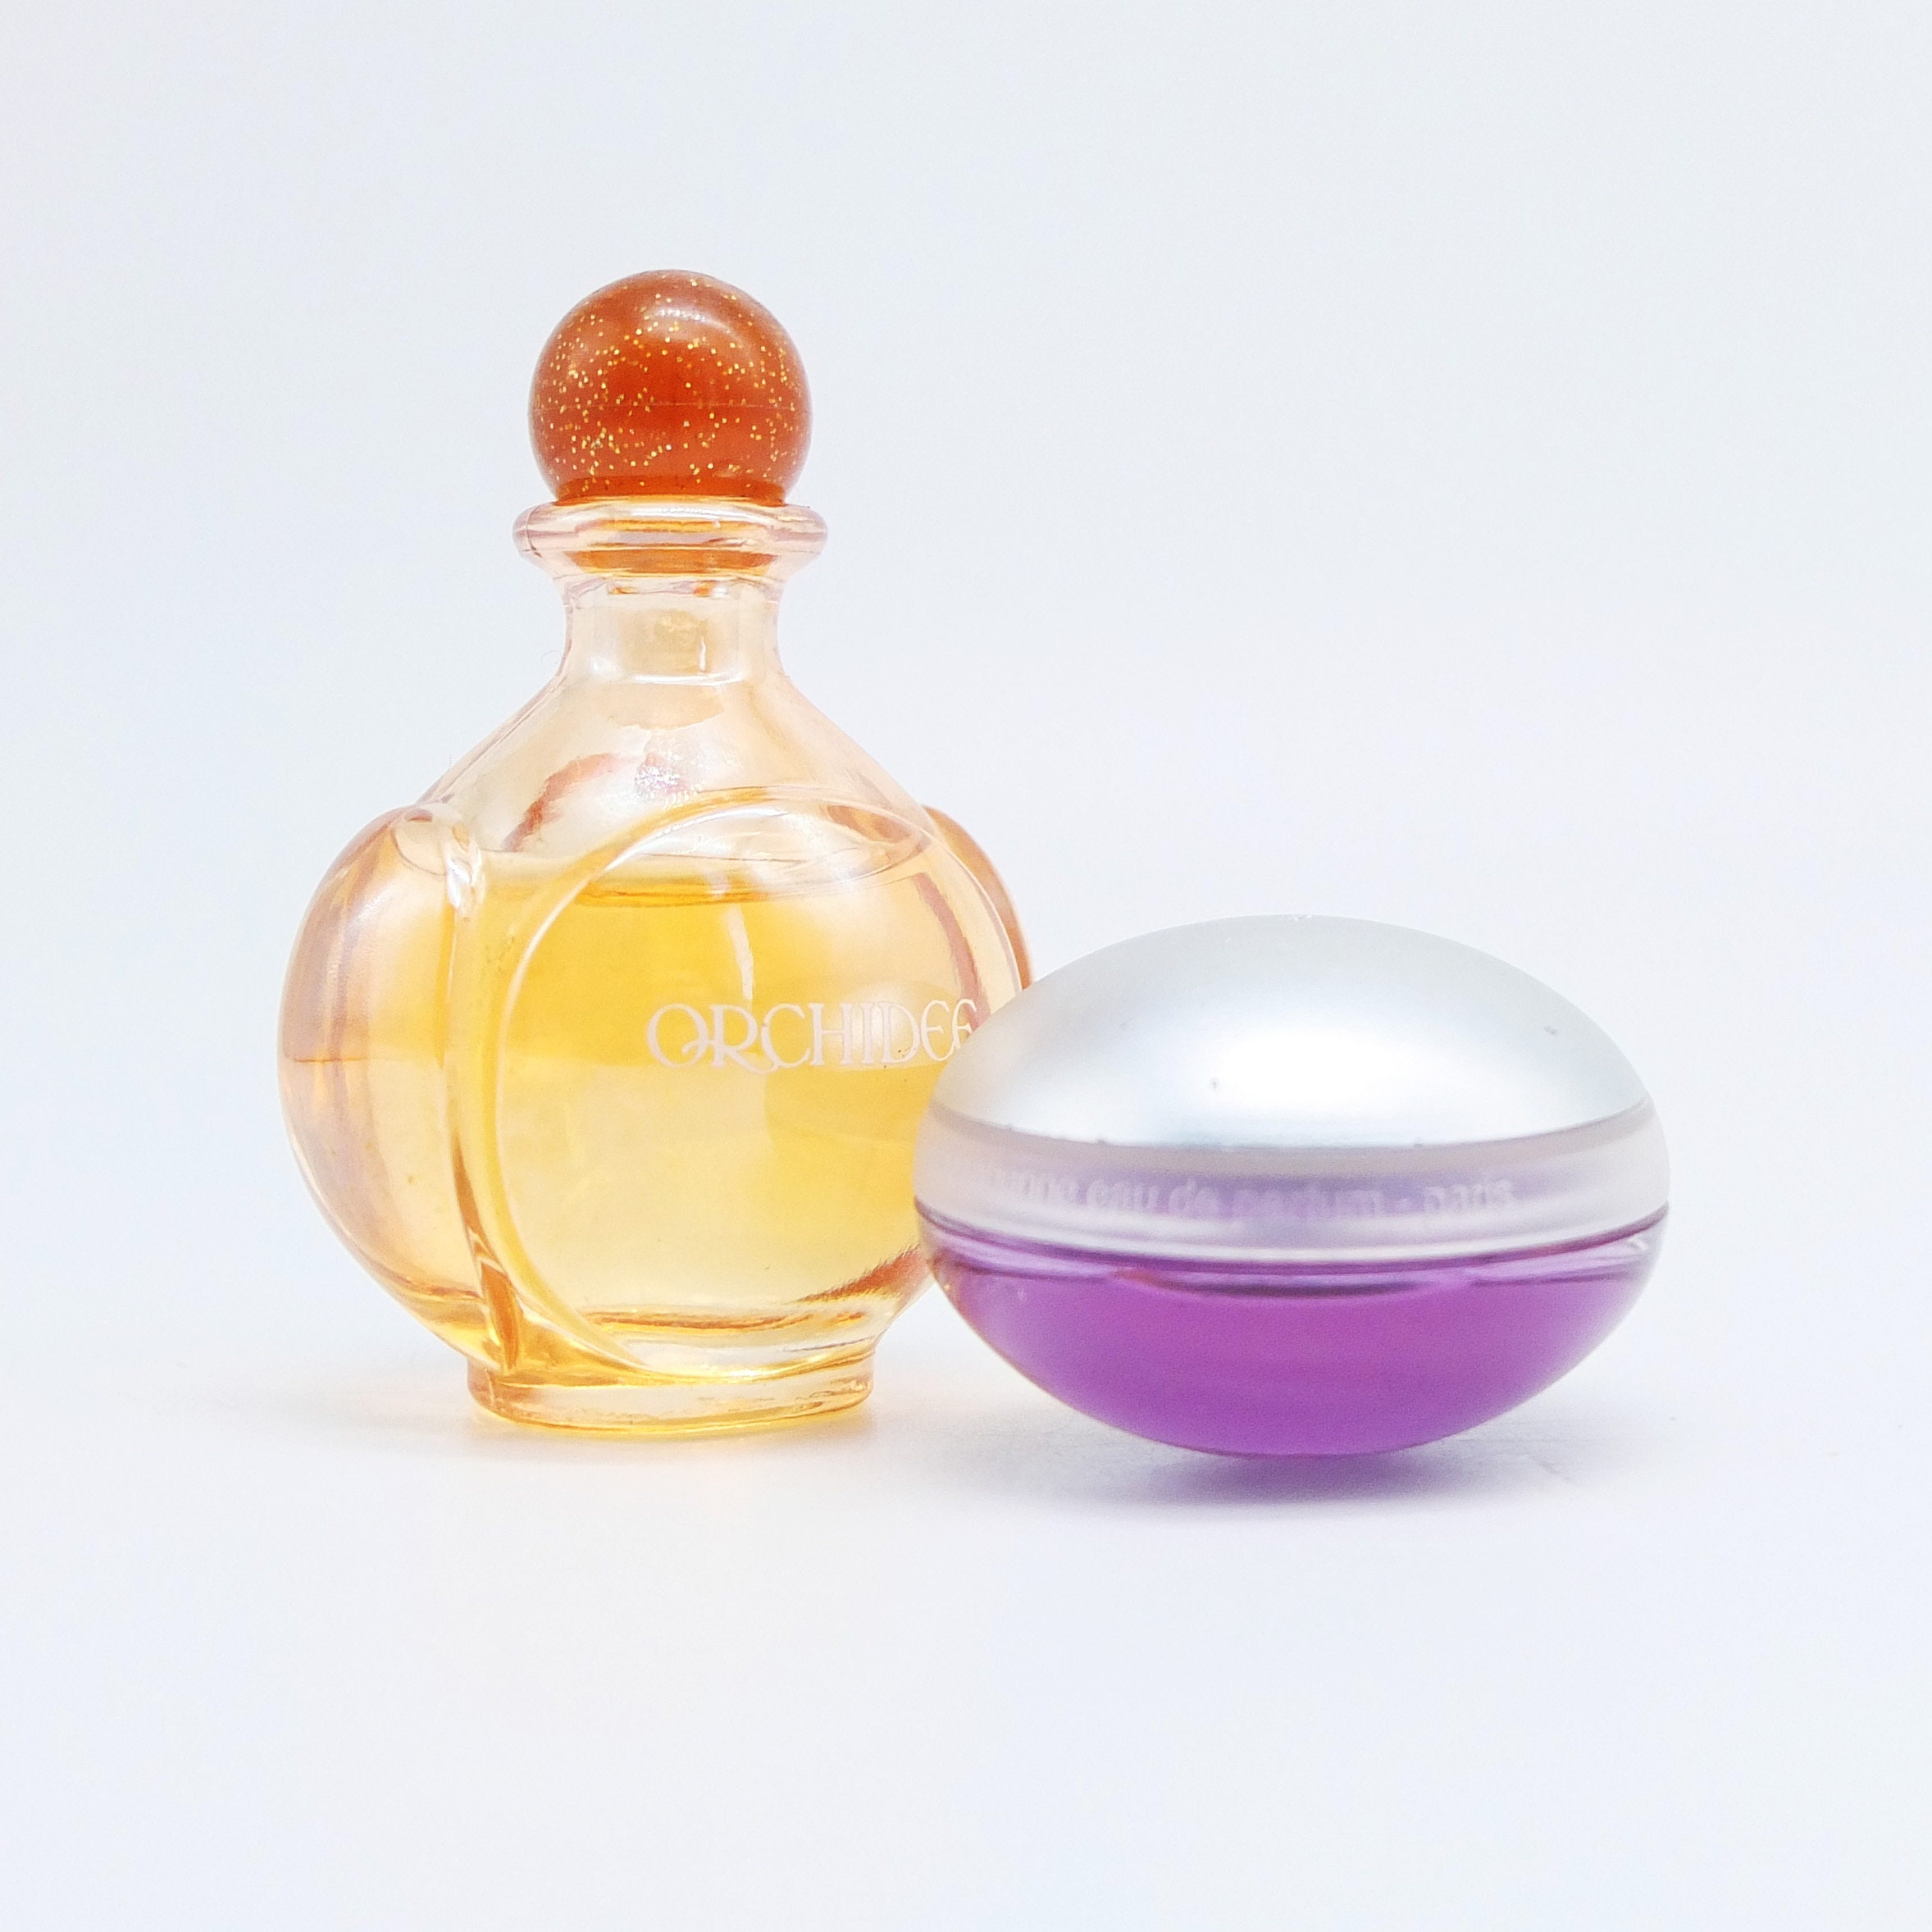 1 Vintage Perfume Miniature Krizia Salvador Dali